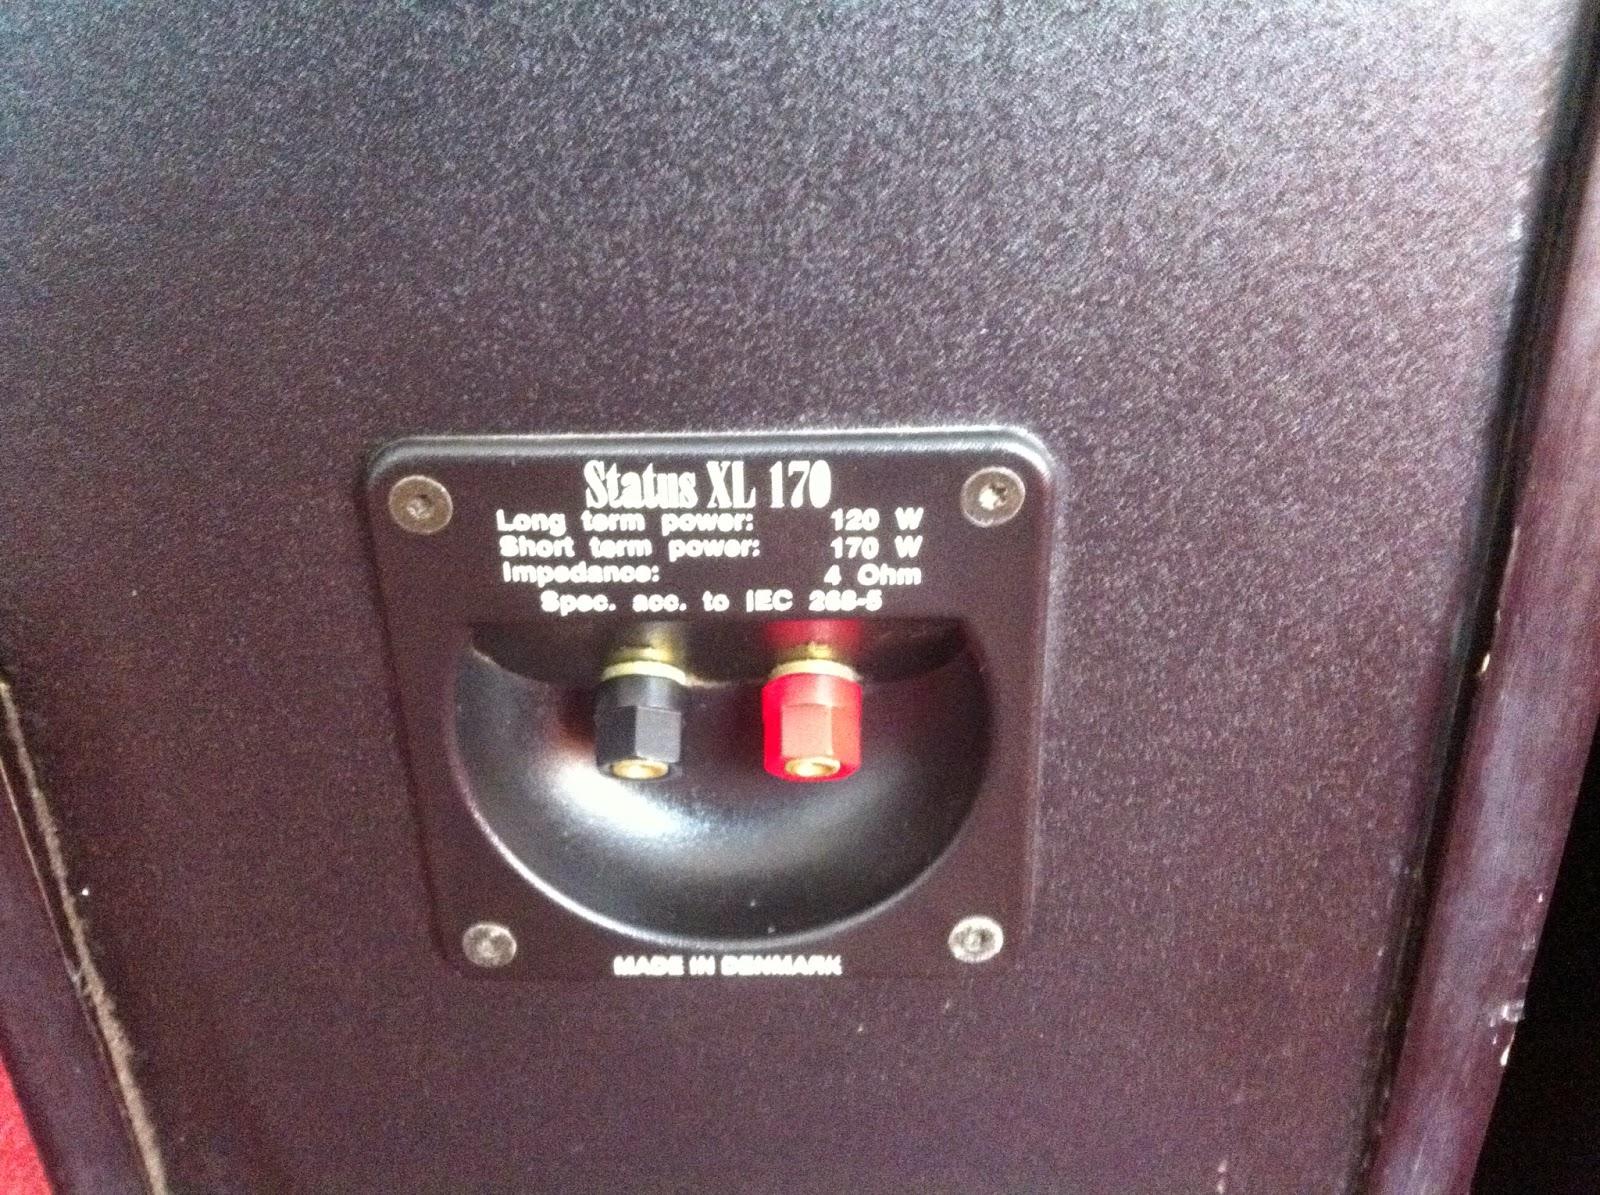 Serial Loa Status XL 170